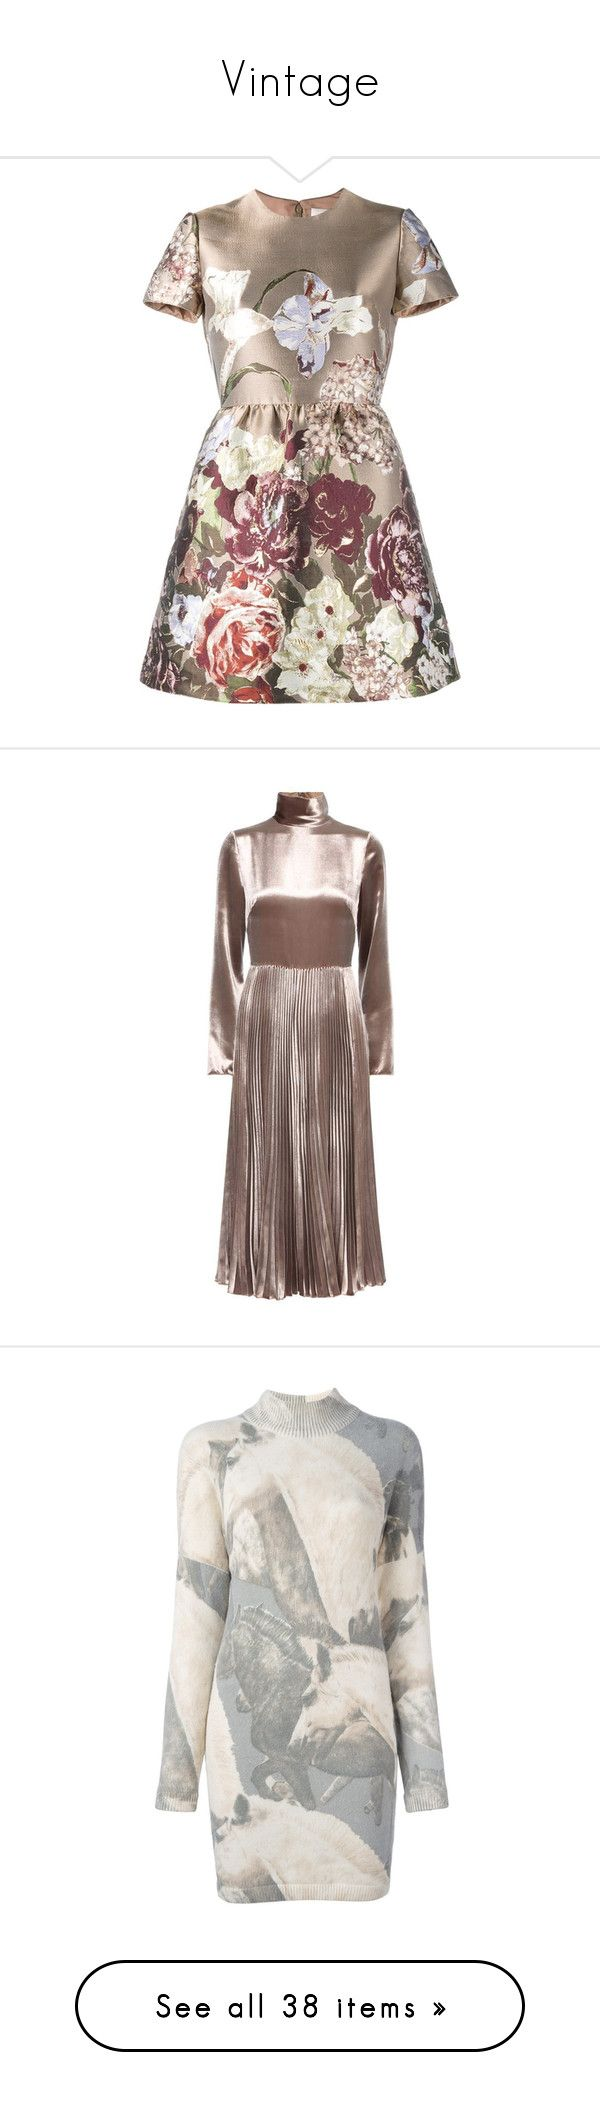 """Vintage"" by wanda-india-acosta ❤ liked on Polyvore featuring dresses, vestidos, short dresses, brown, short kimono dress, flared skirt, circle skirt, short-sleeve dresses, velvet and neutrals"